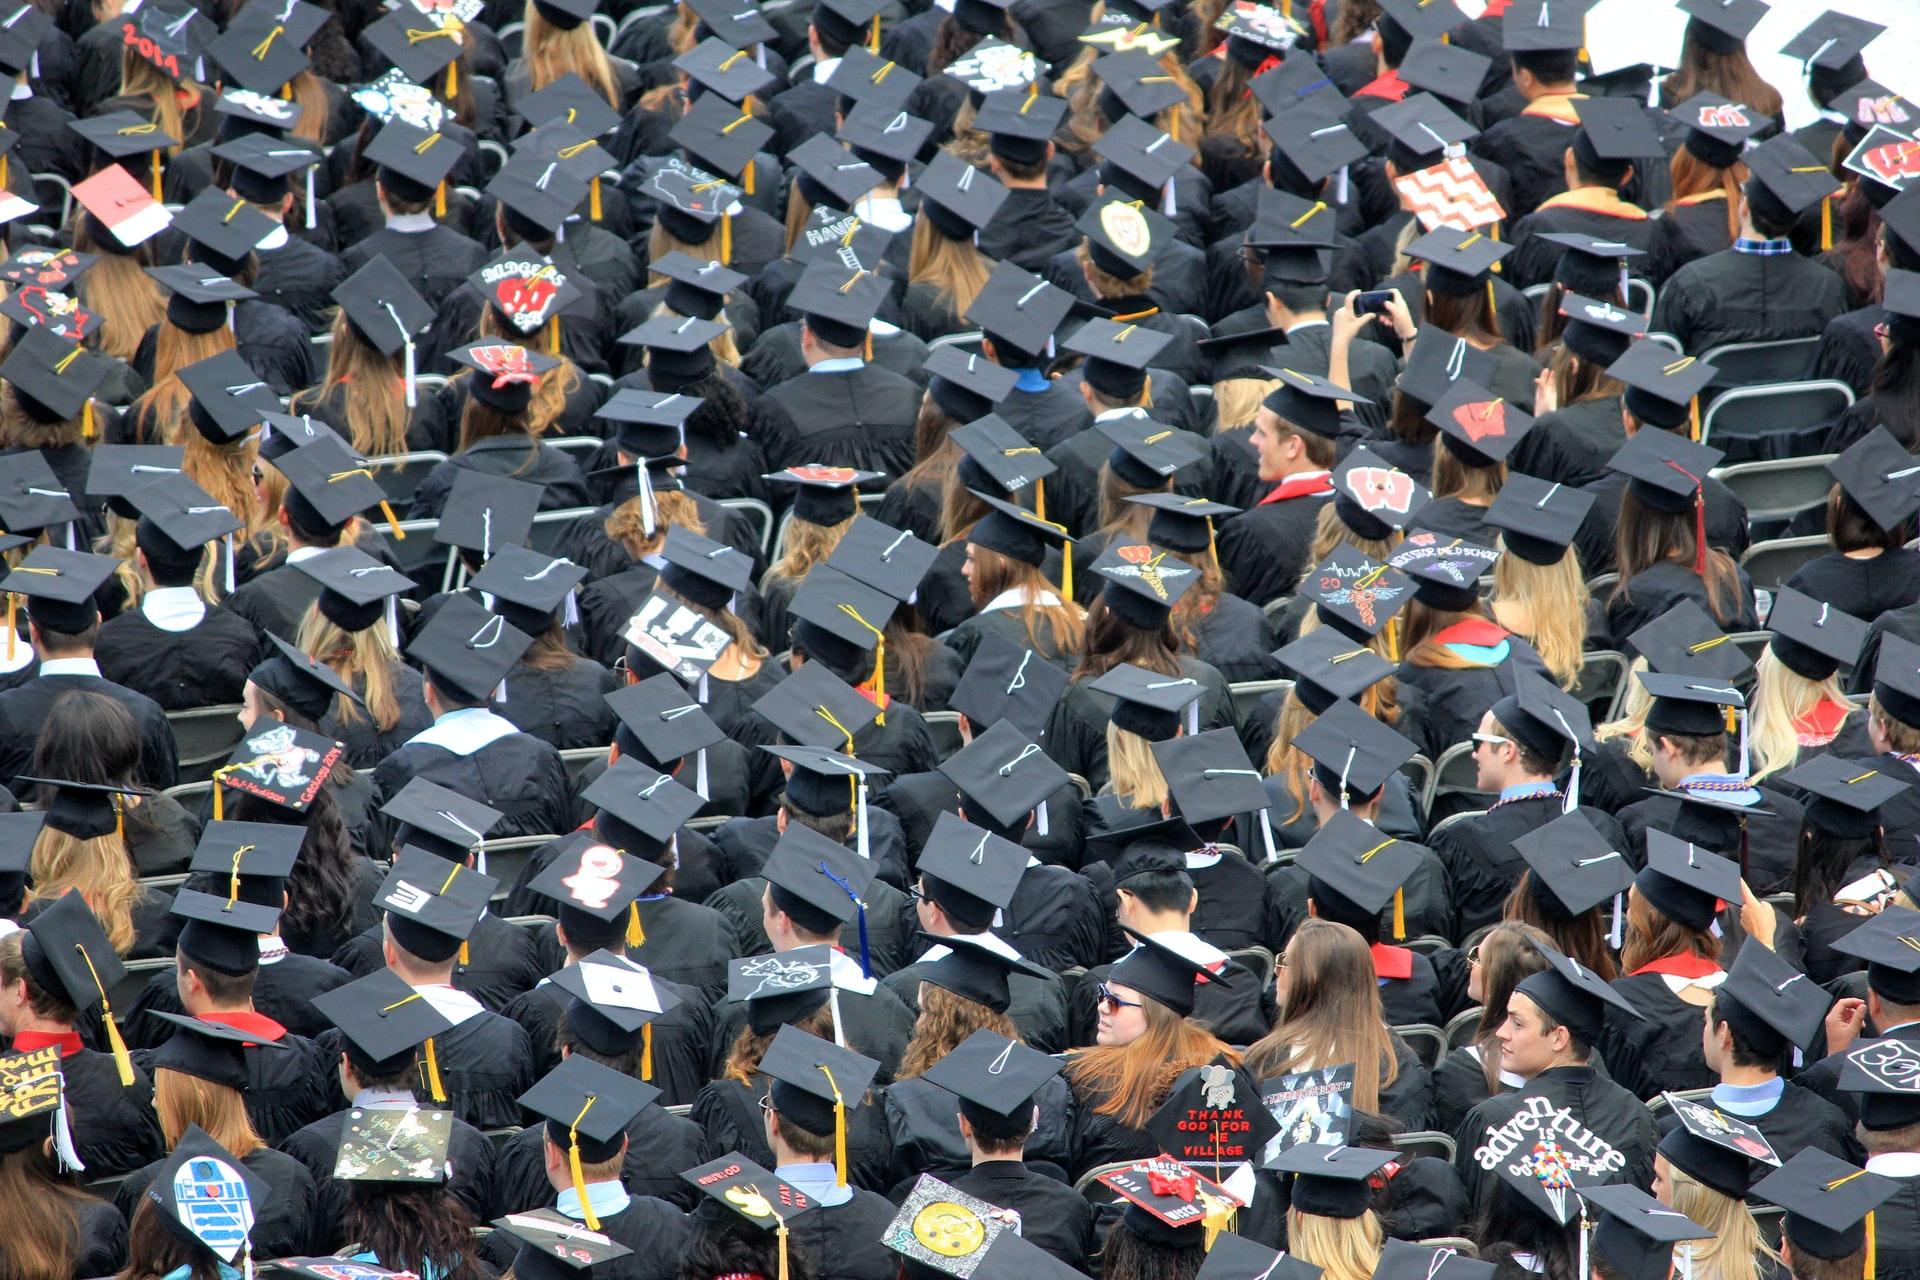 University students at their graduation ceremony.